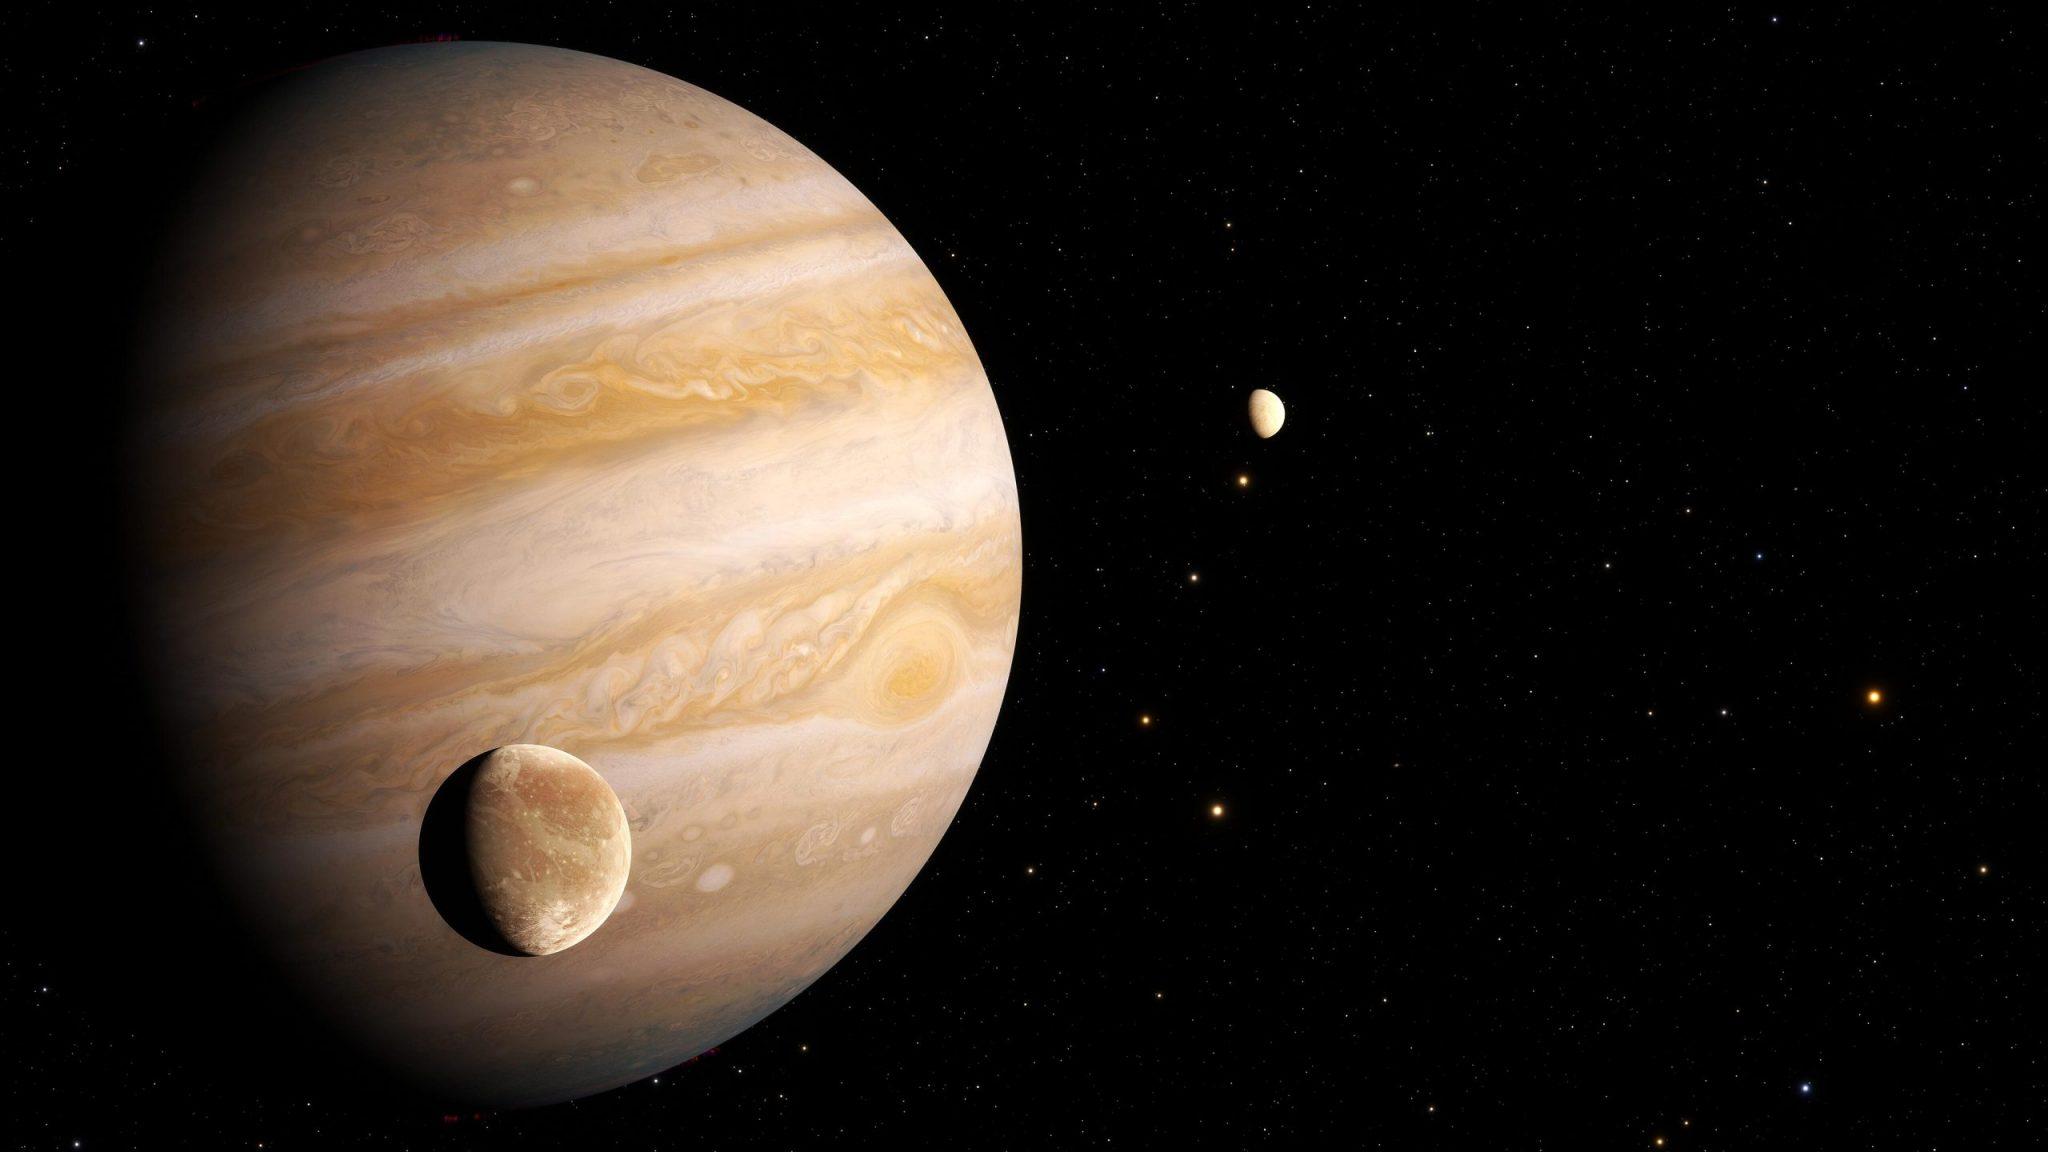 Hubble Finds First Evidence of Water Vapor at Jupiter's Moon Ganymede | வியாழனின் துணை கோள் கேன்மீடில் நீர் நீராவியின் முதல் ஆதாரத்தை ஹப்பிள் கண்டுபிடித்துள்ளது |_40.1